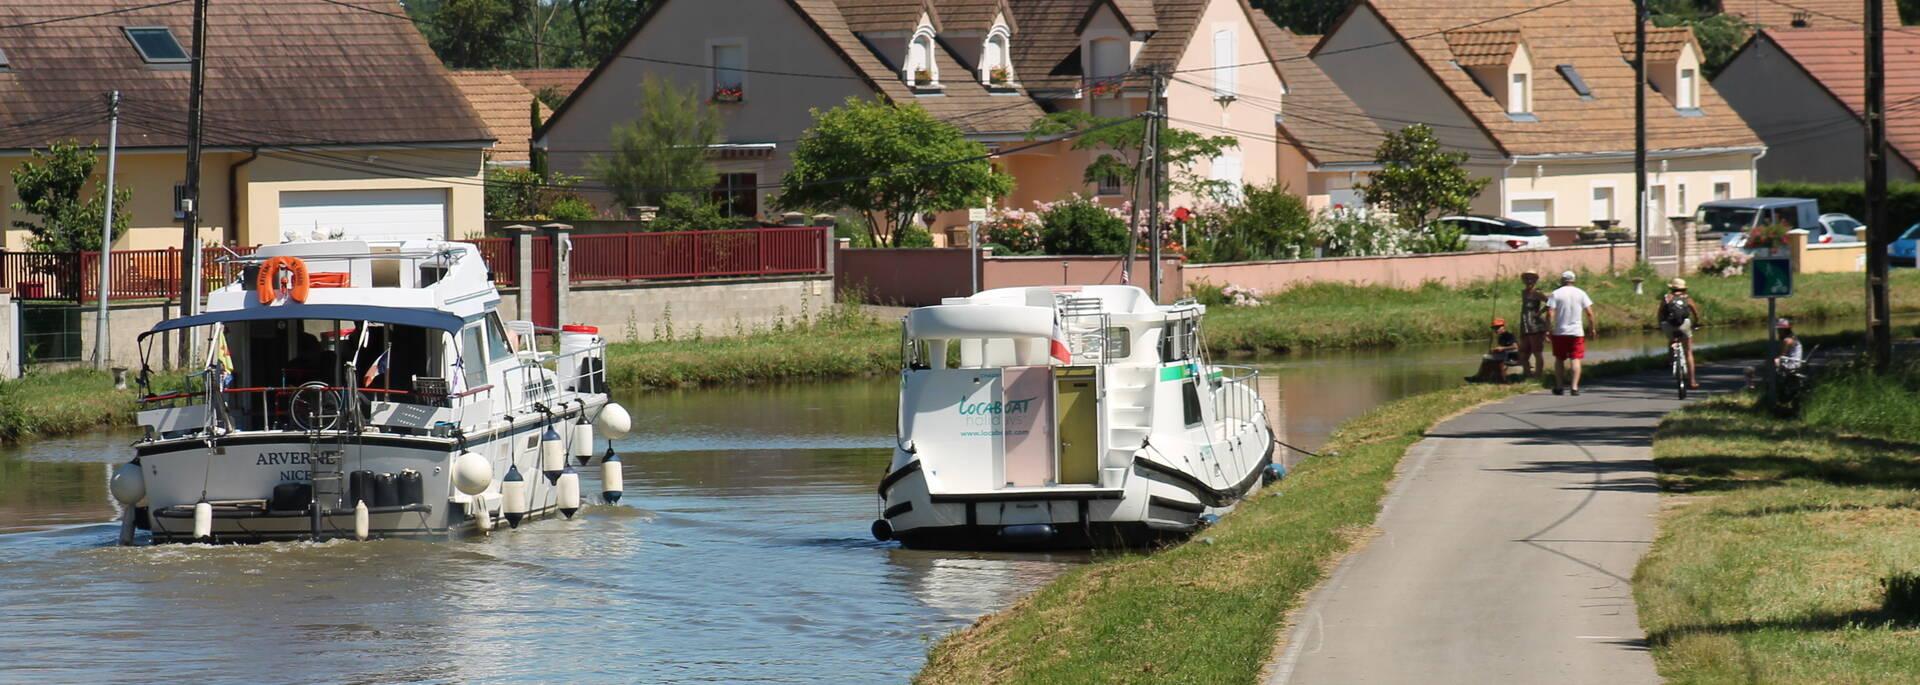 Canal du centre à Rully